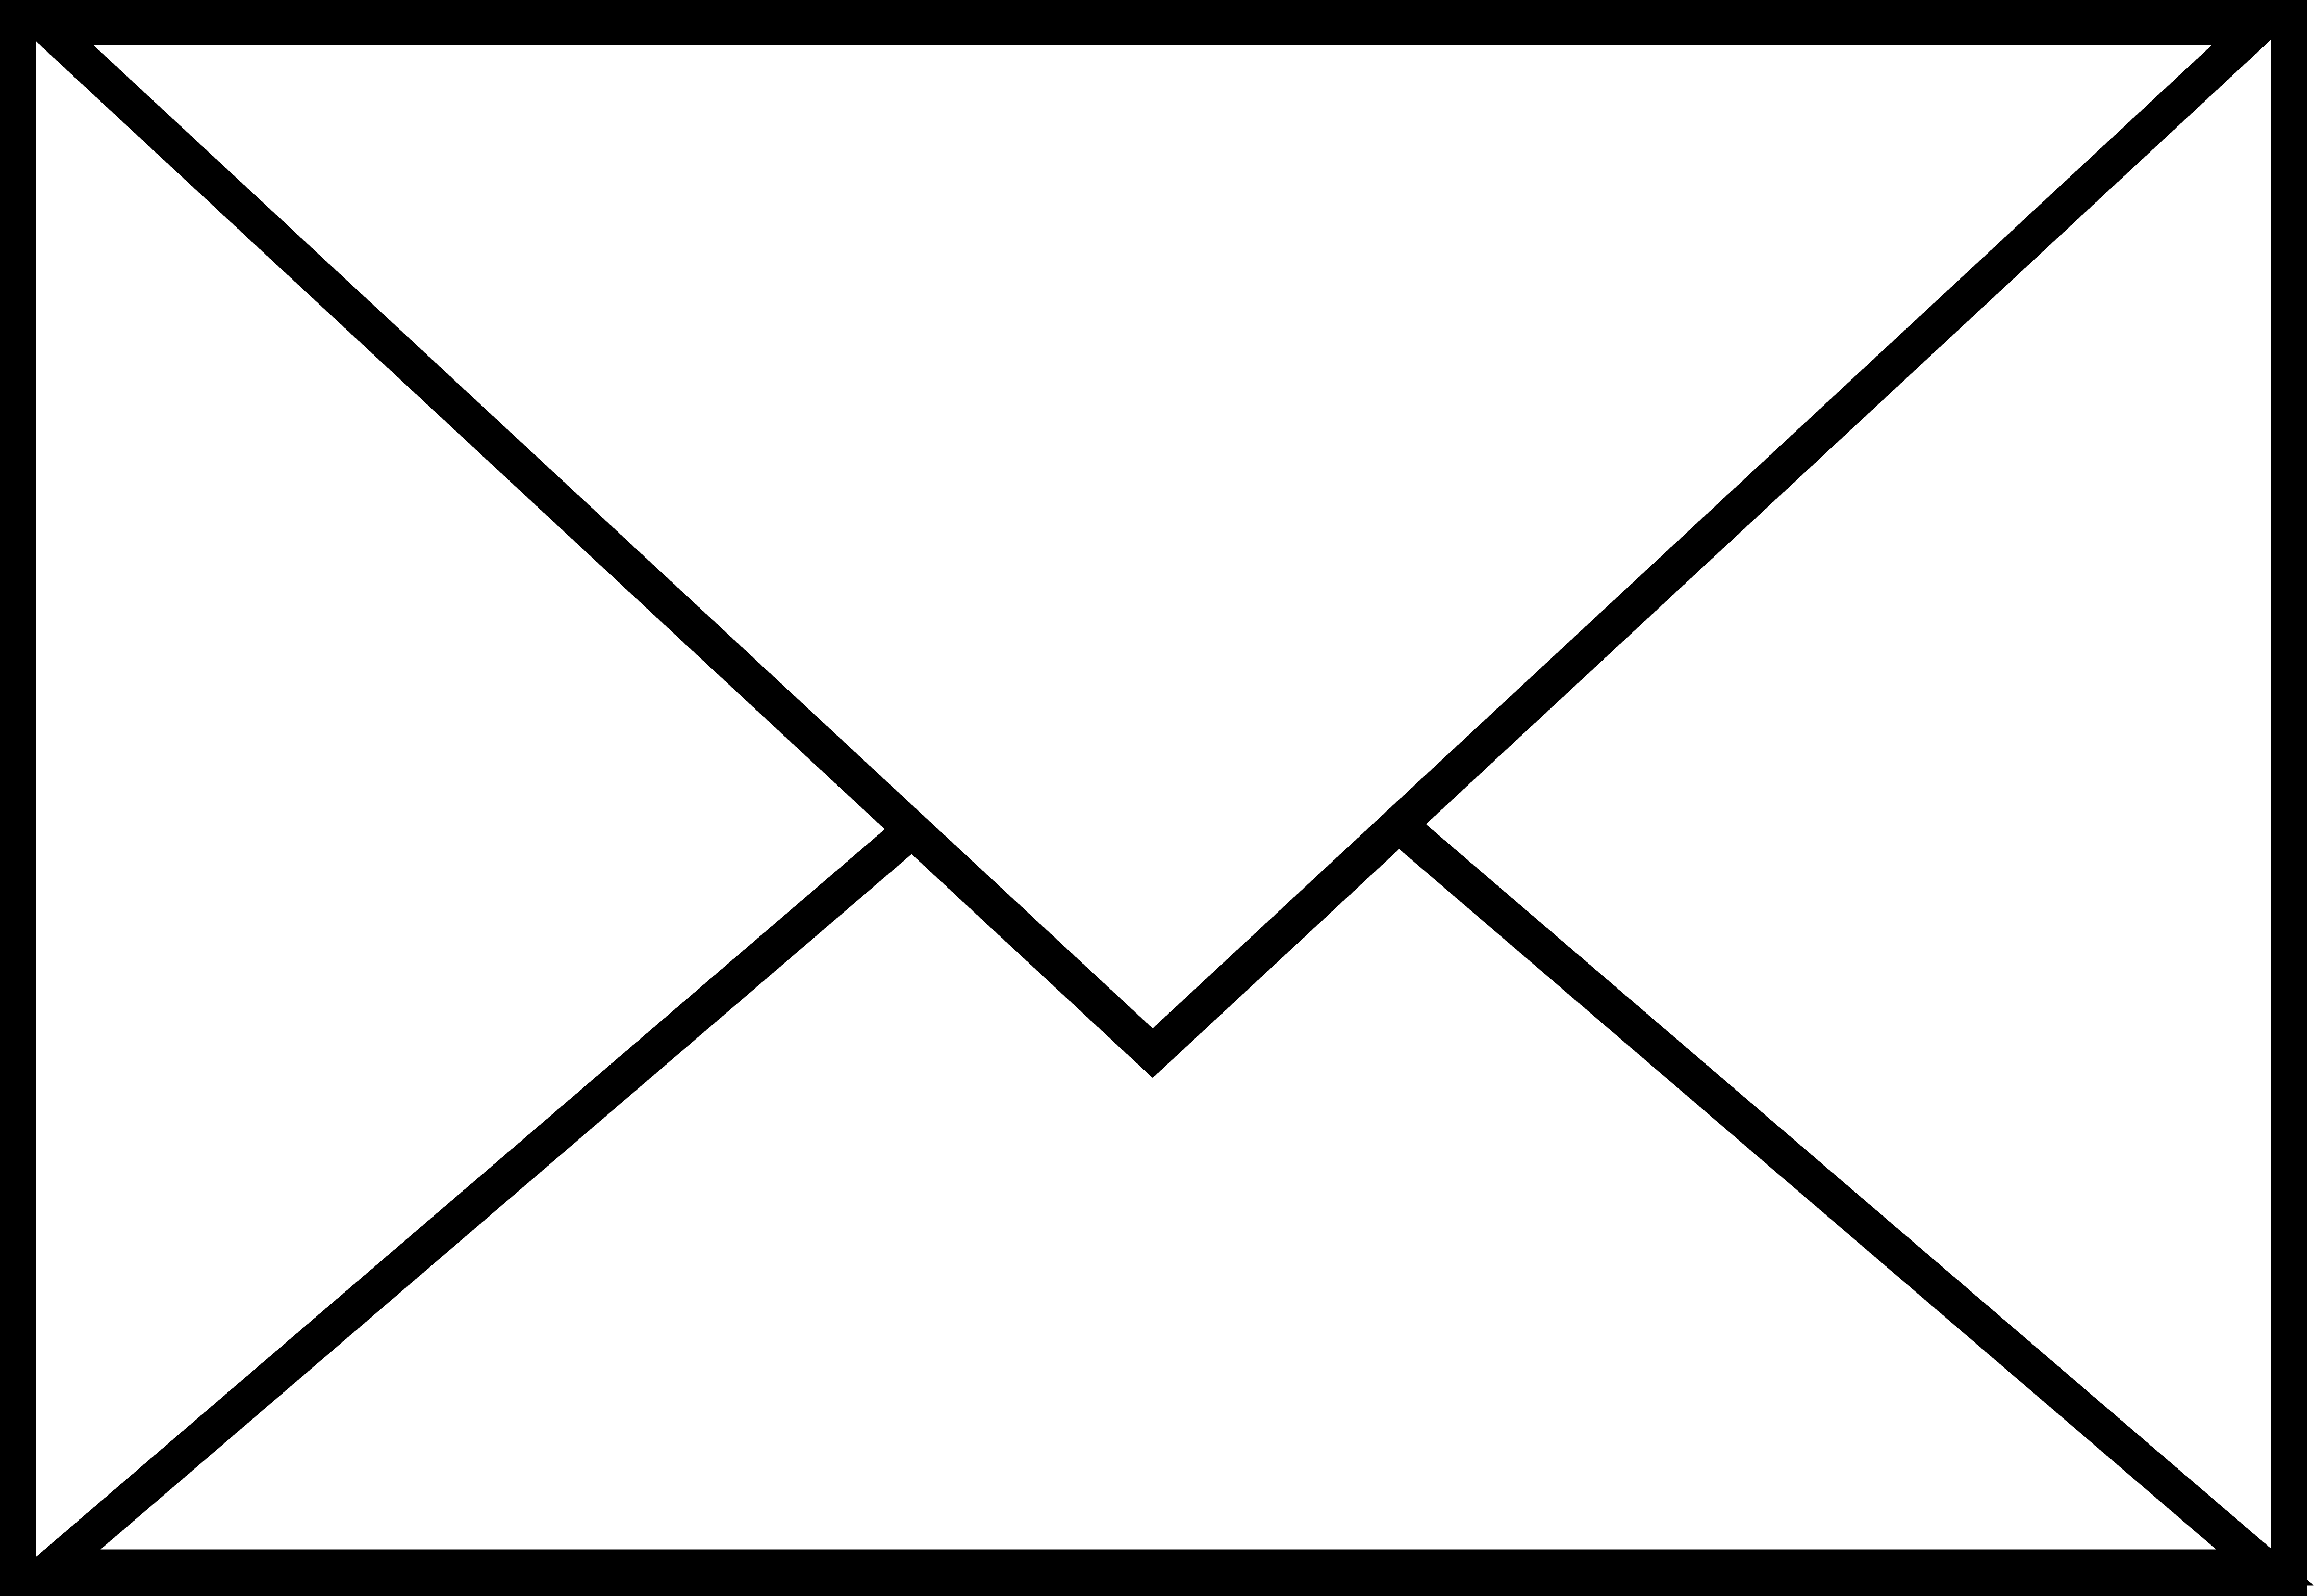 Message clipart black and white Message%20clipart Envelope Clipart Clipart Images